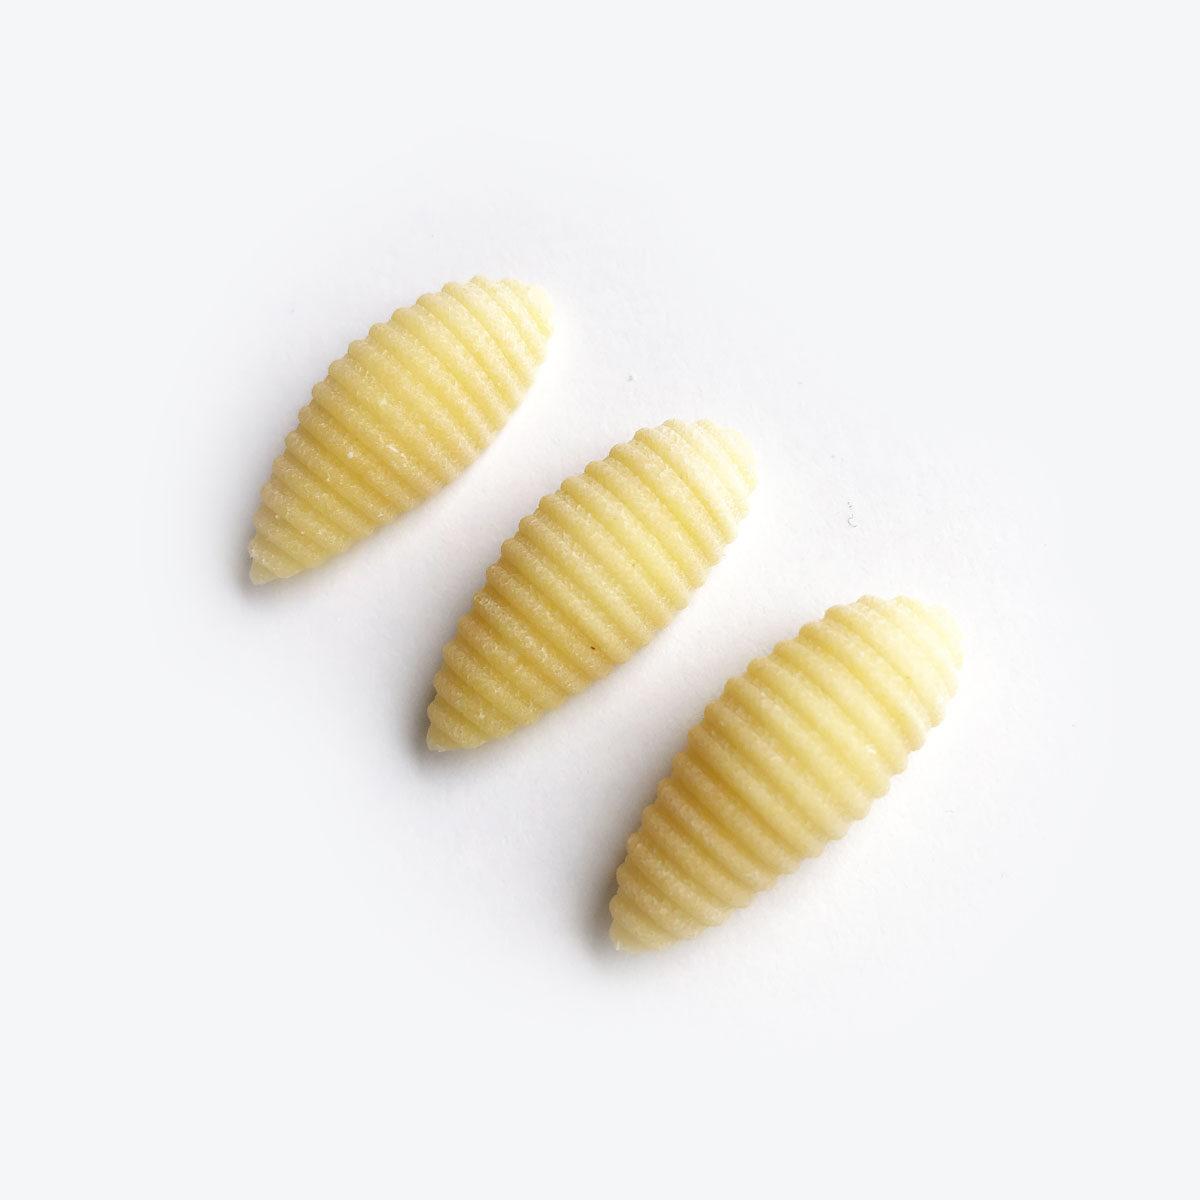 F632-Gnocco_sardo_bombato_pasta